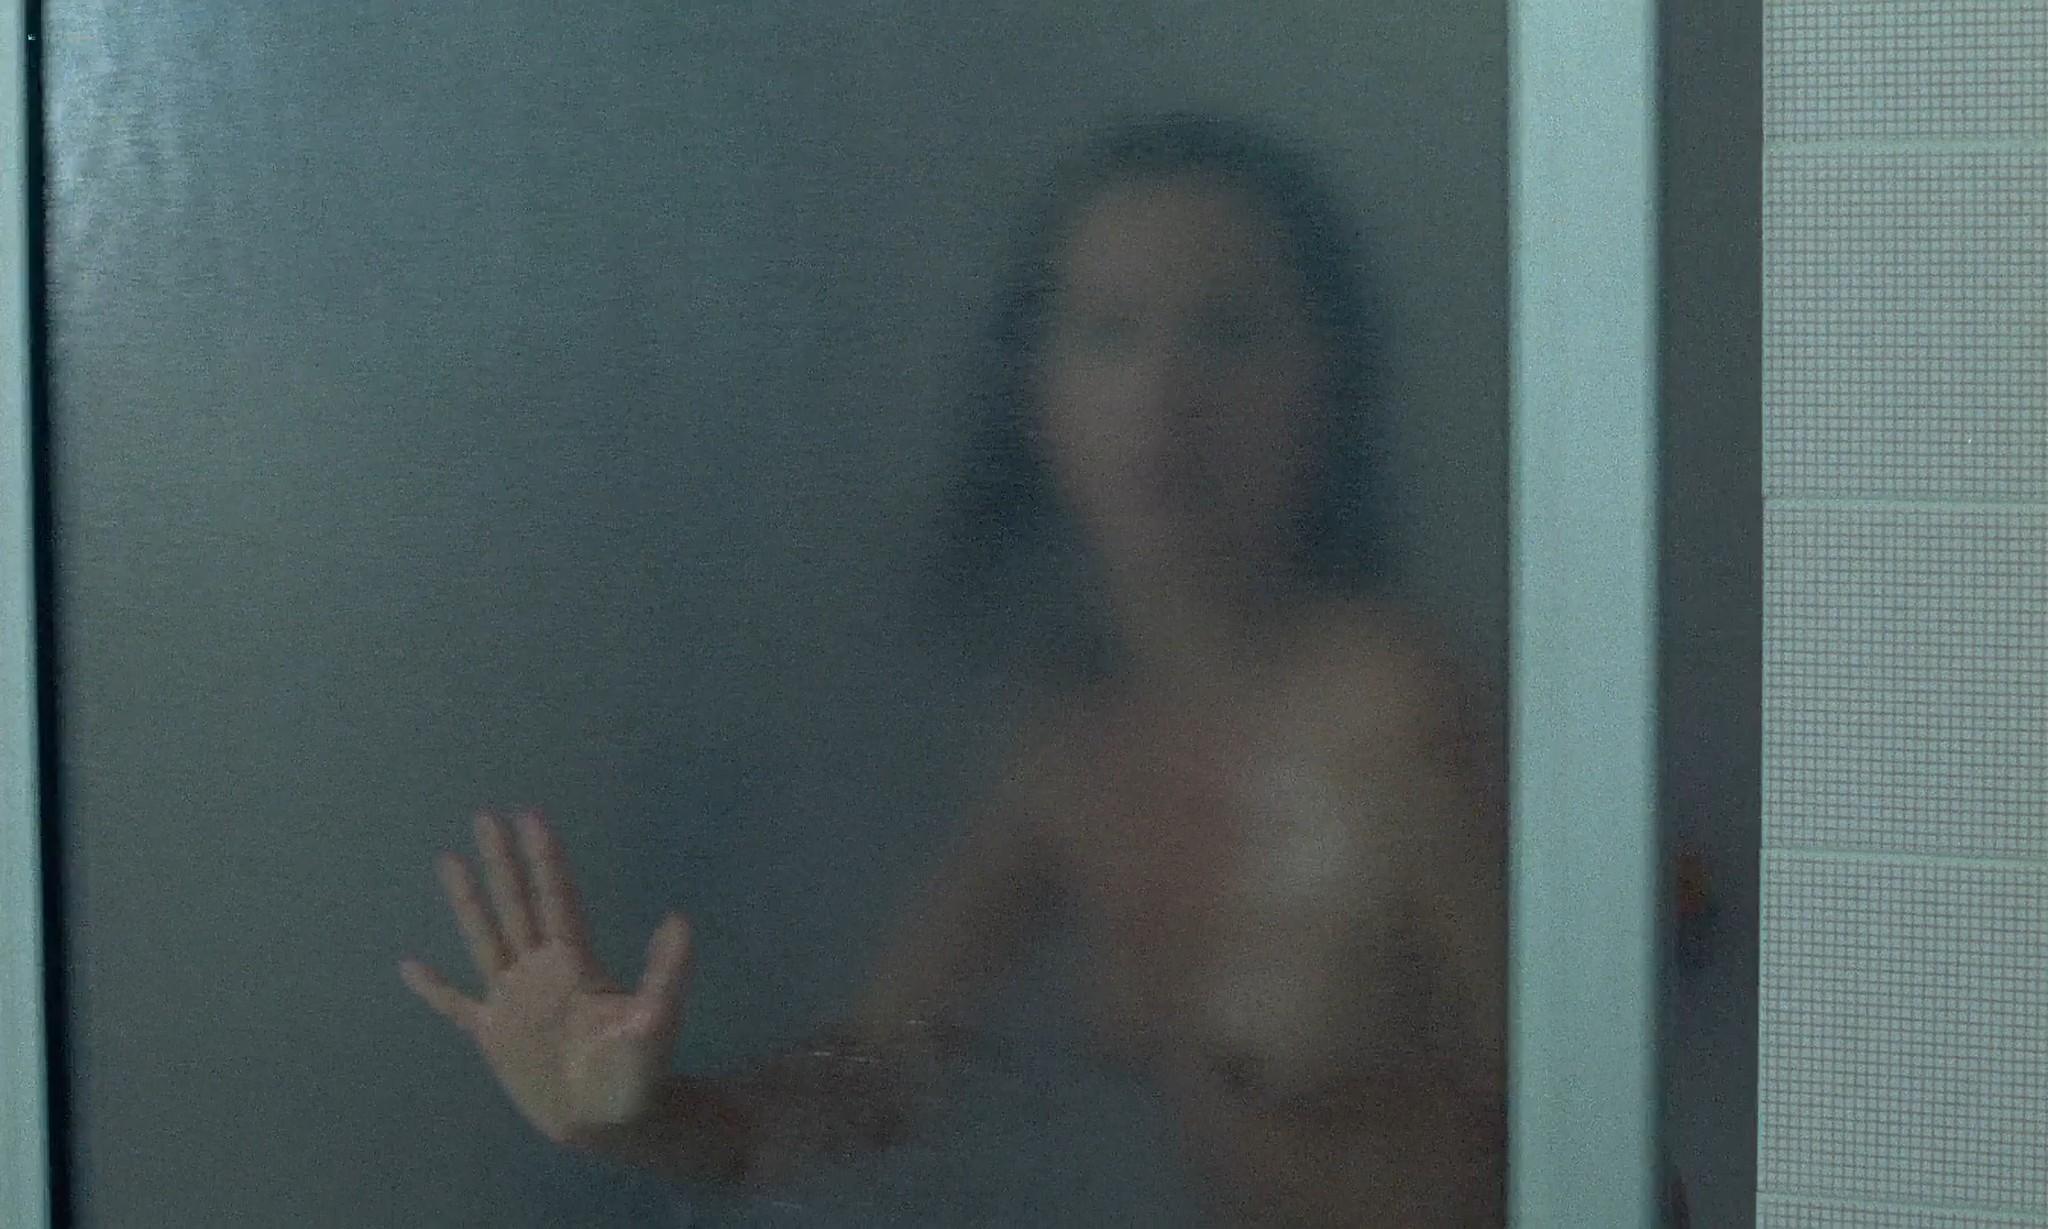 Nathalie Baye nude in the shower En toute innocence FR 1988 1080p BluRay 12